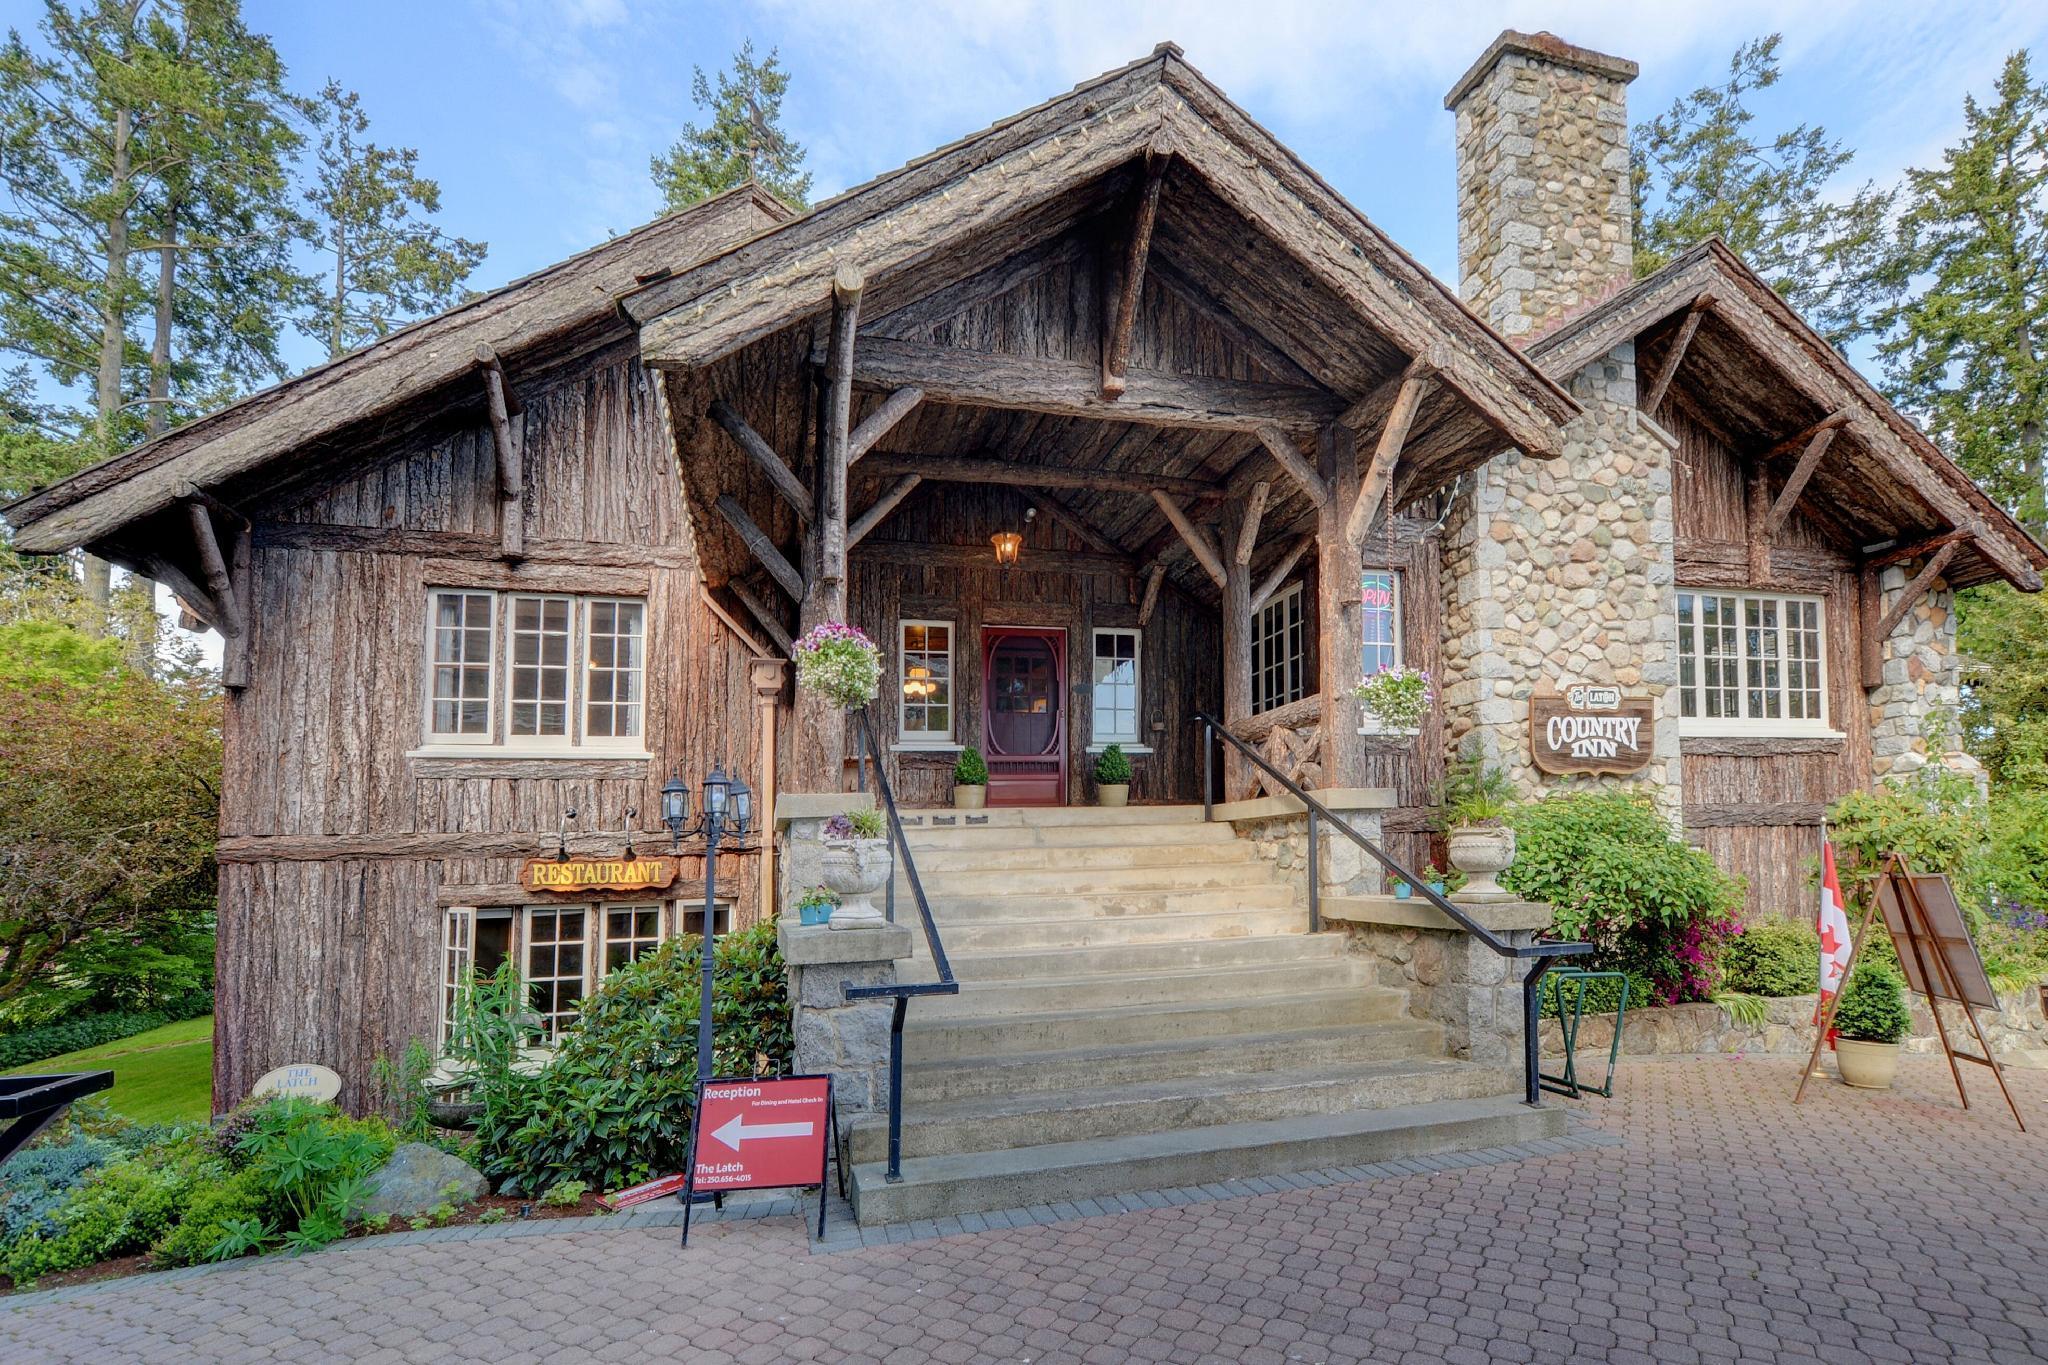 The Latch Inn And Restaurant